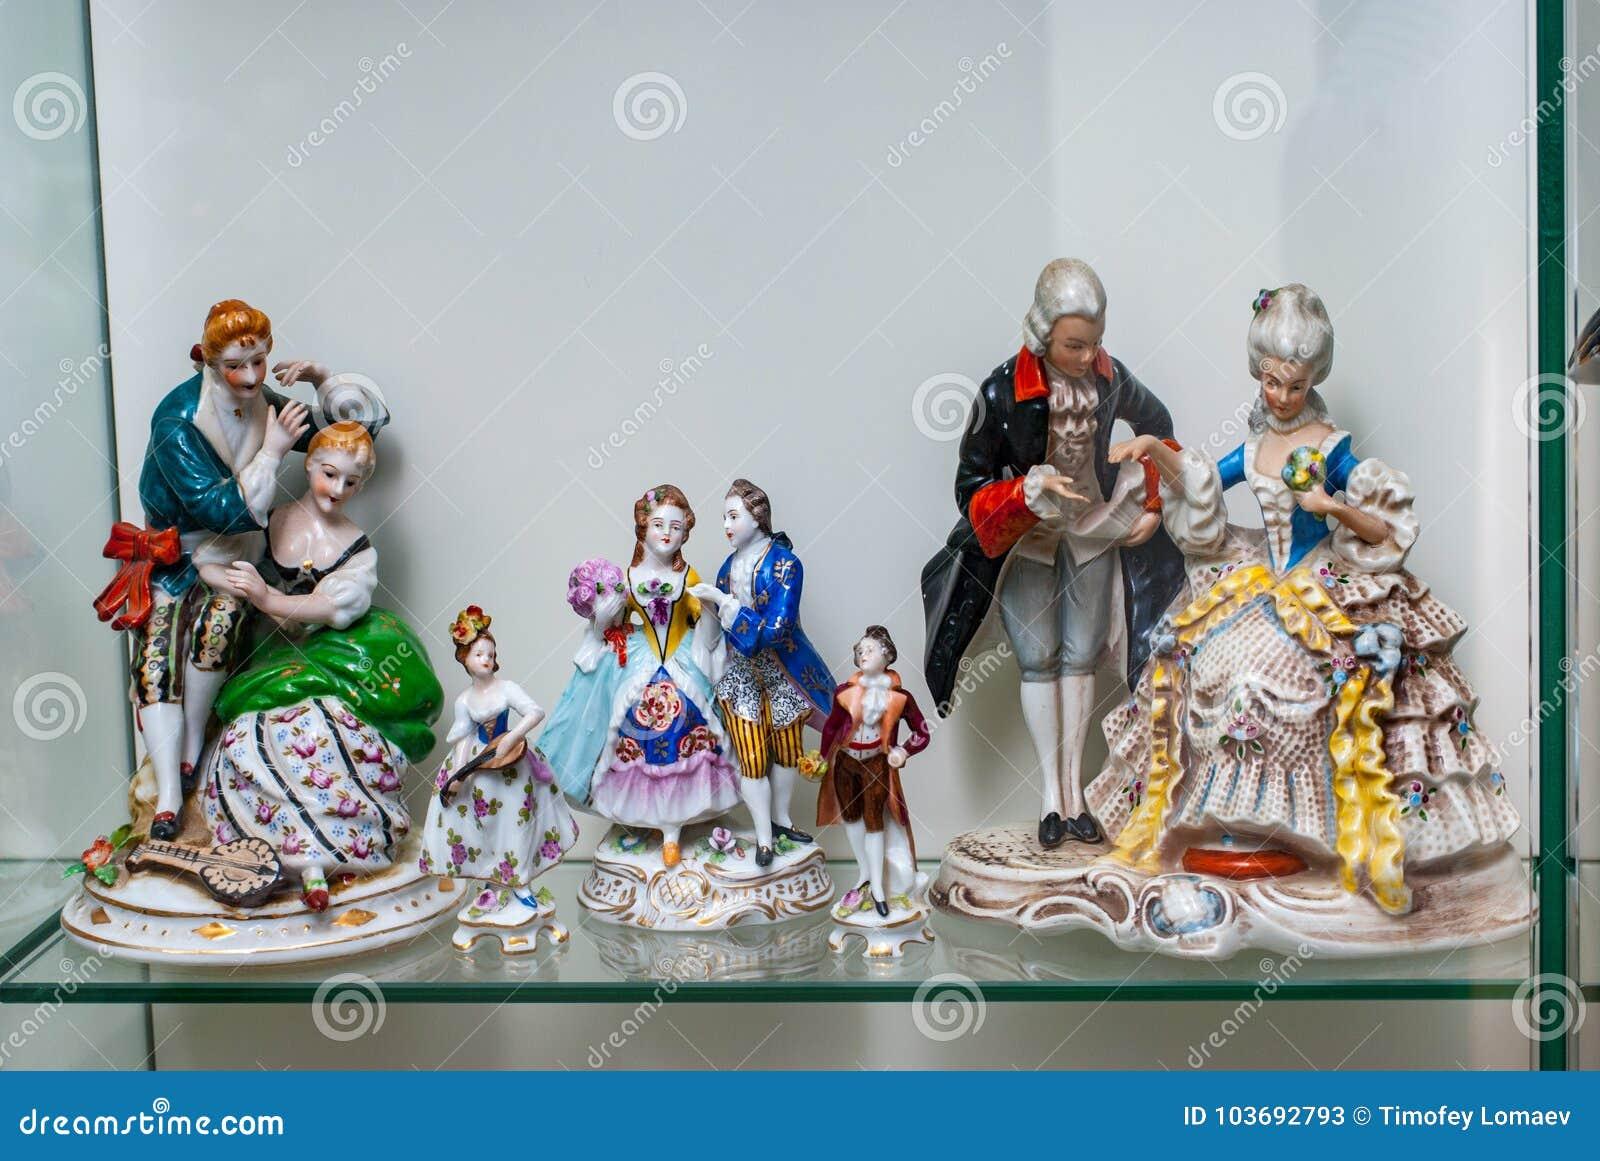 Assortment Of Rare Porcelain Figurines On Glass Shelf Stock Image